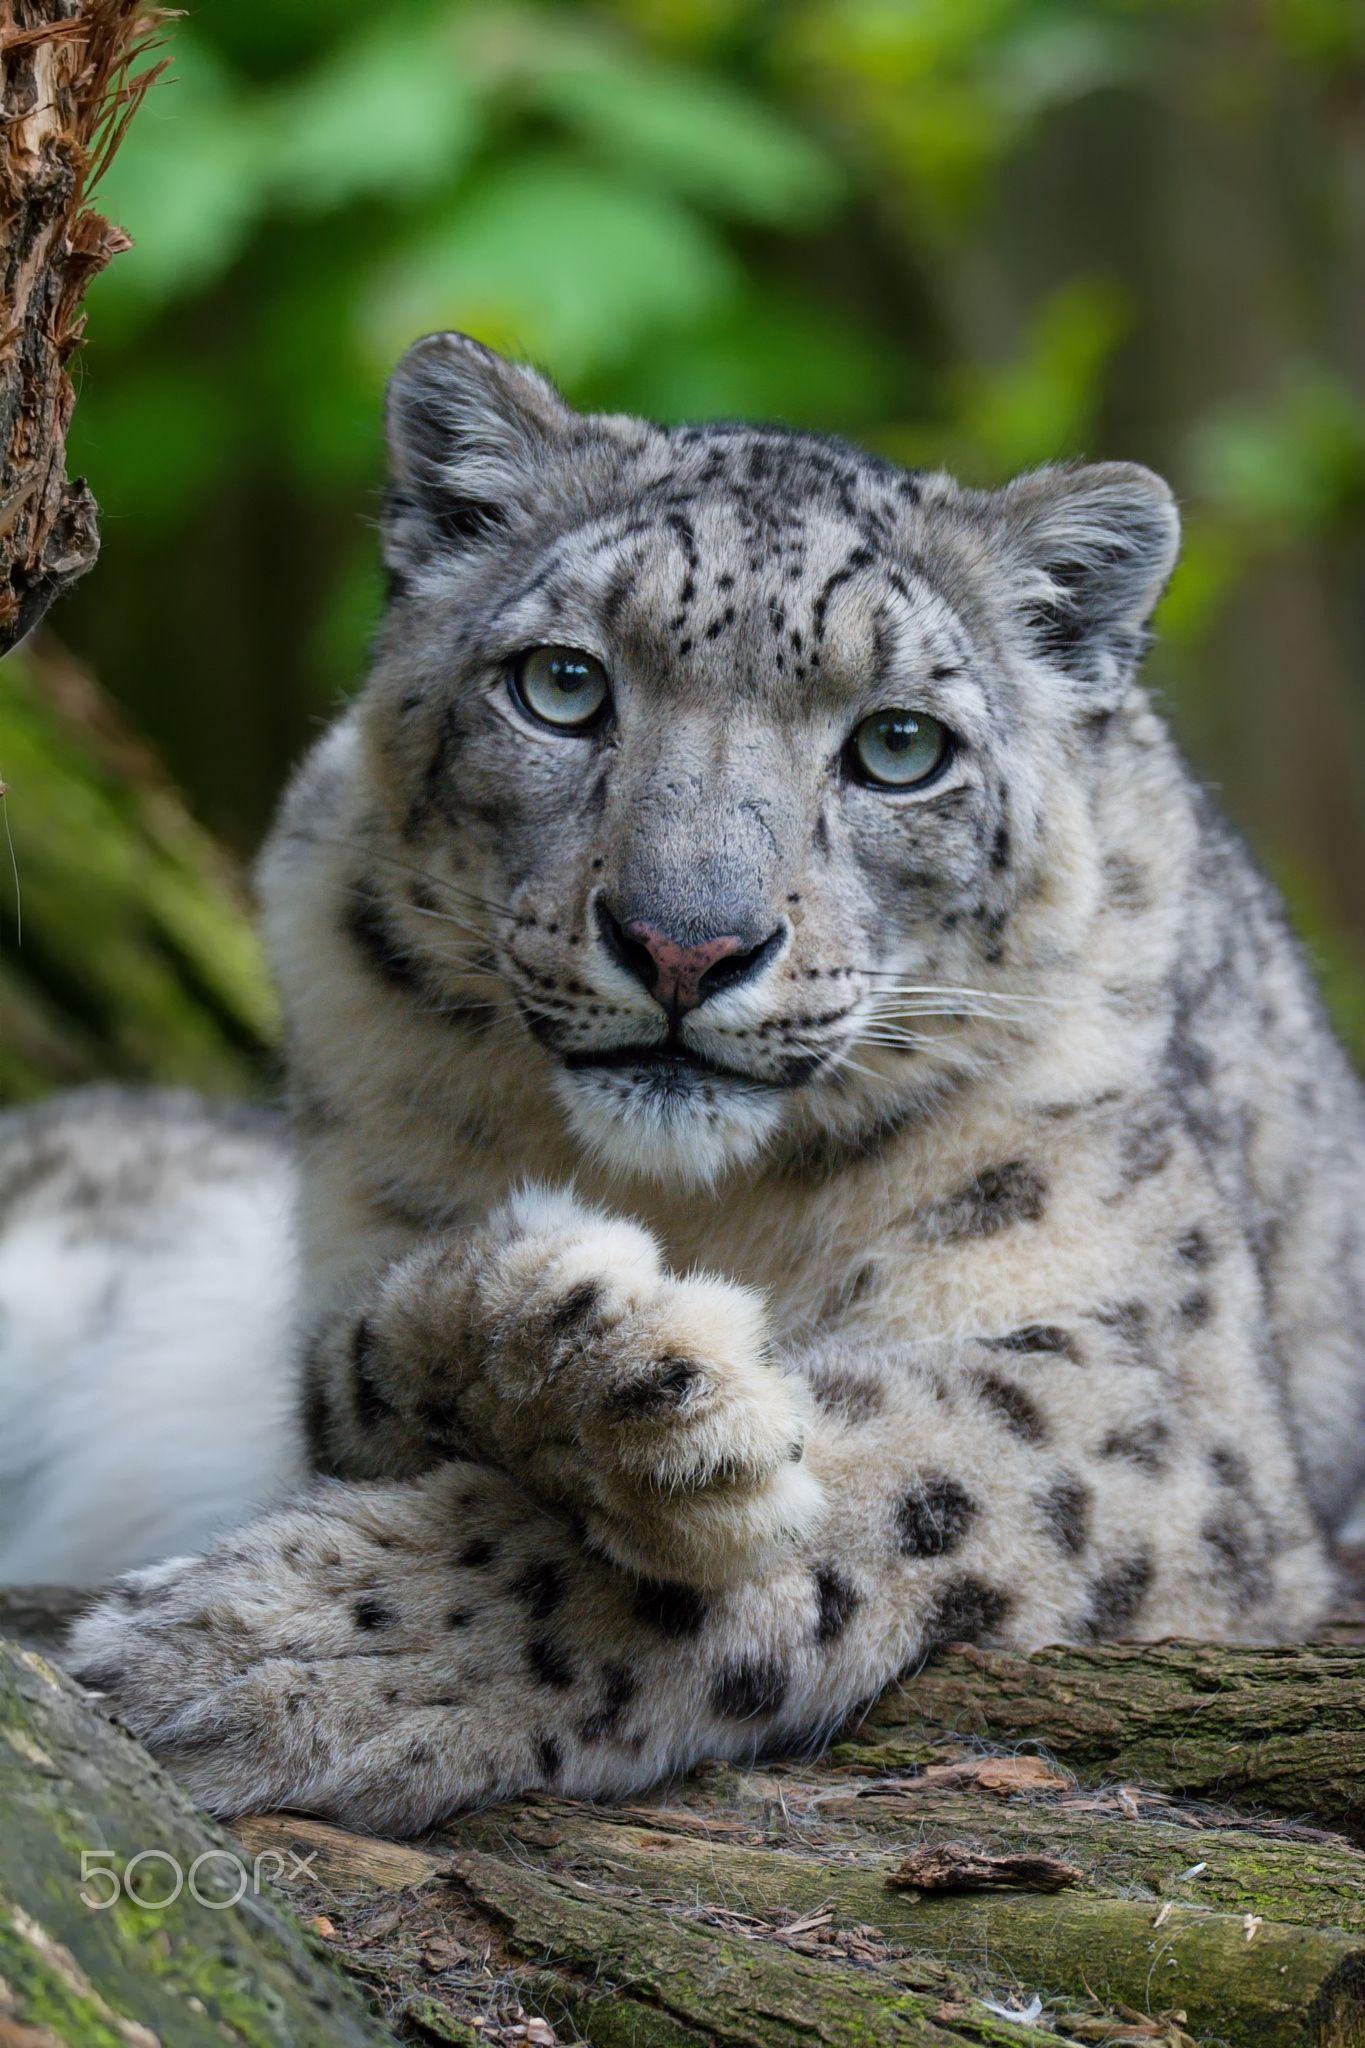 "Snow leopard - <a href=""https://www.facebook.com/OndrejChvatalFotograf/"">Facebook</a> / <a href=""https://www.ondrejchvatal.cz"">Ondrej Chvatal</a>"